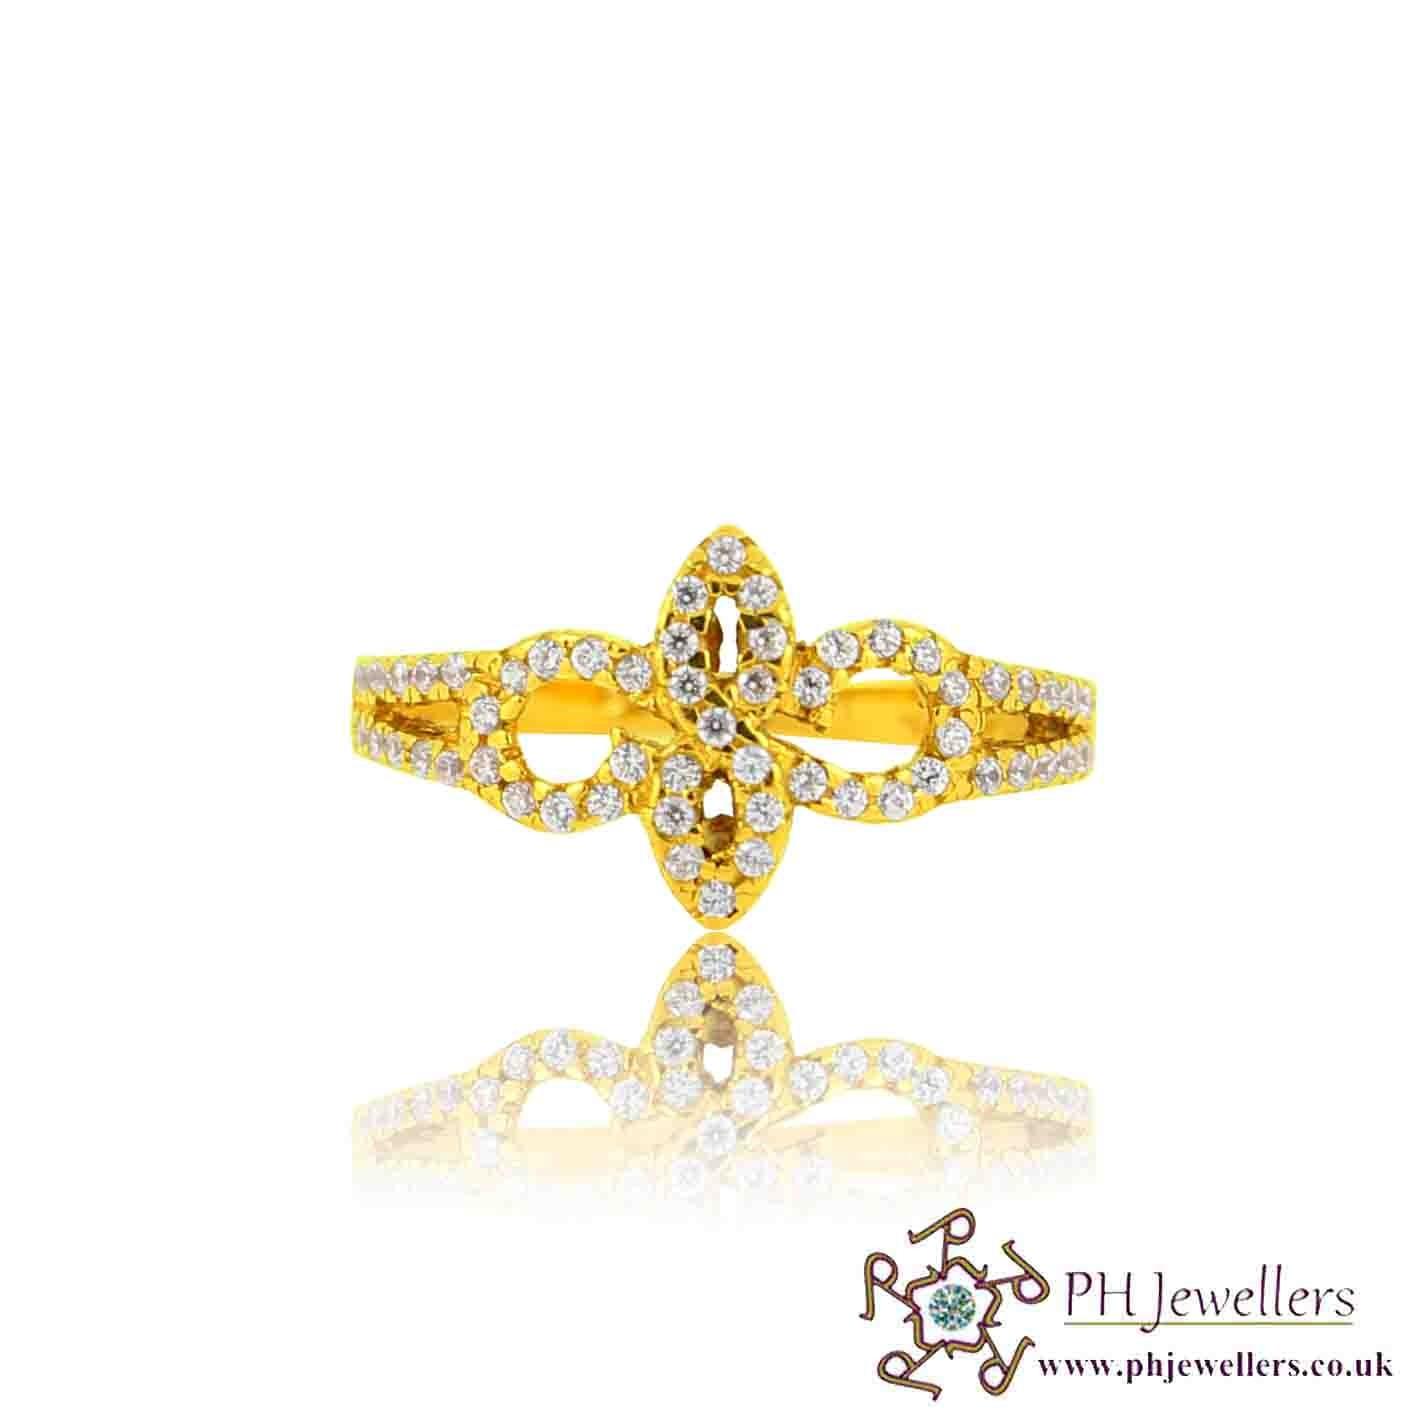 22ct 916 Yellow Gold Hallmark  Ring CZ Size P ,O SR119